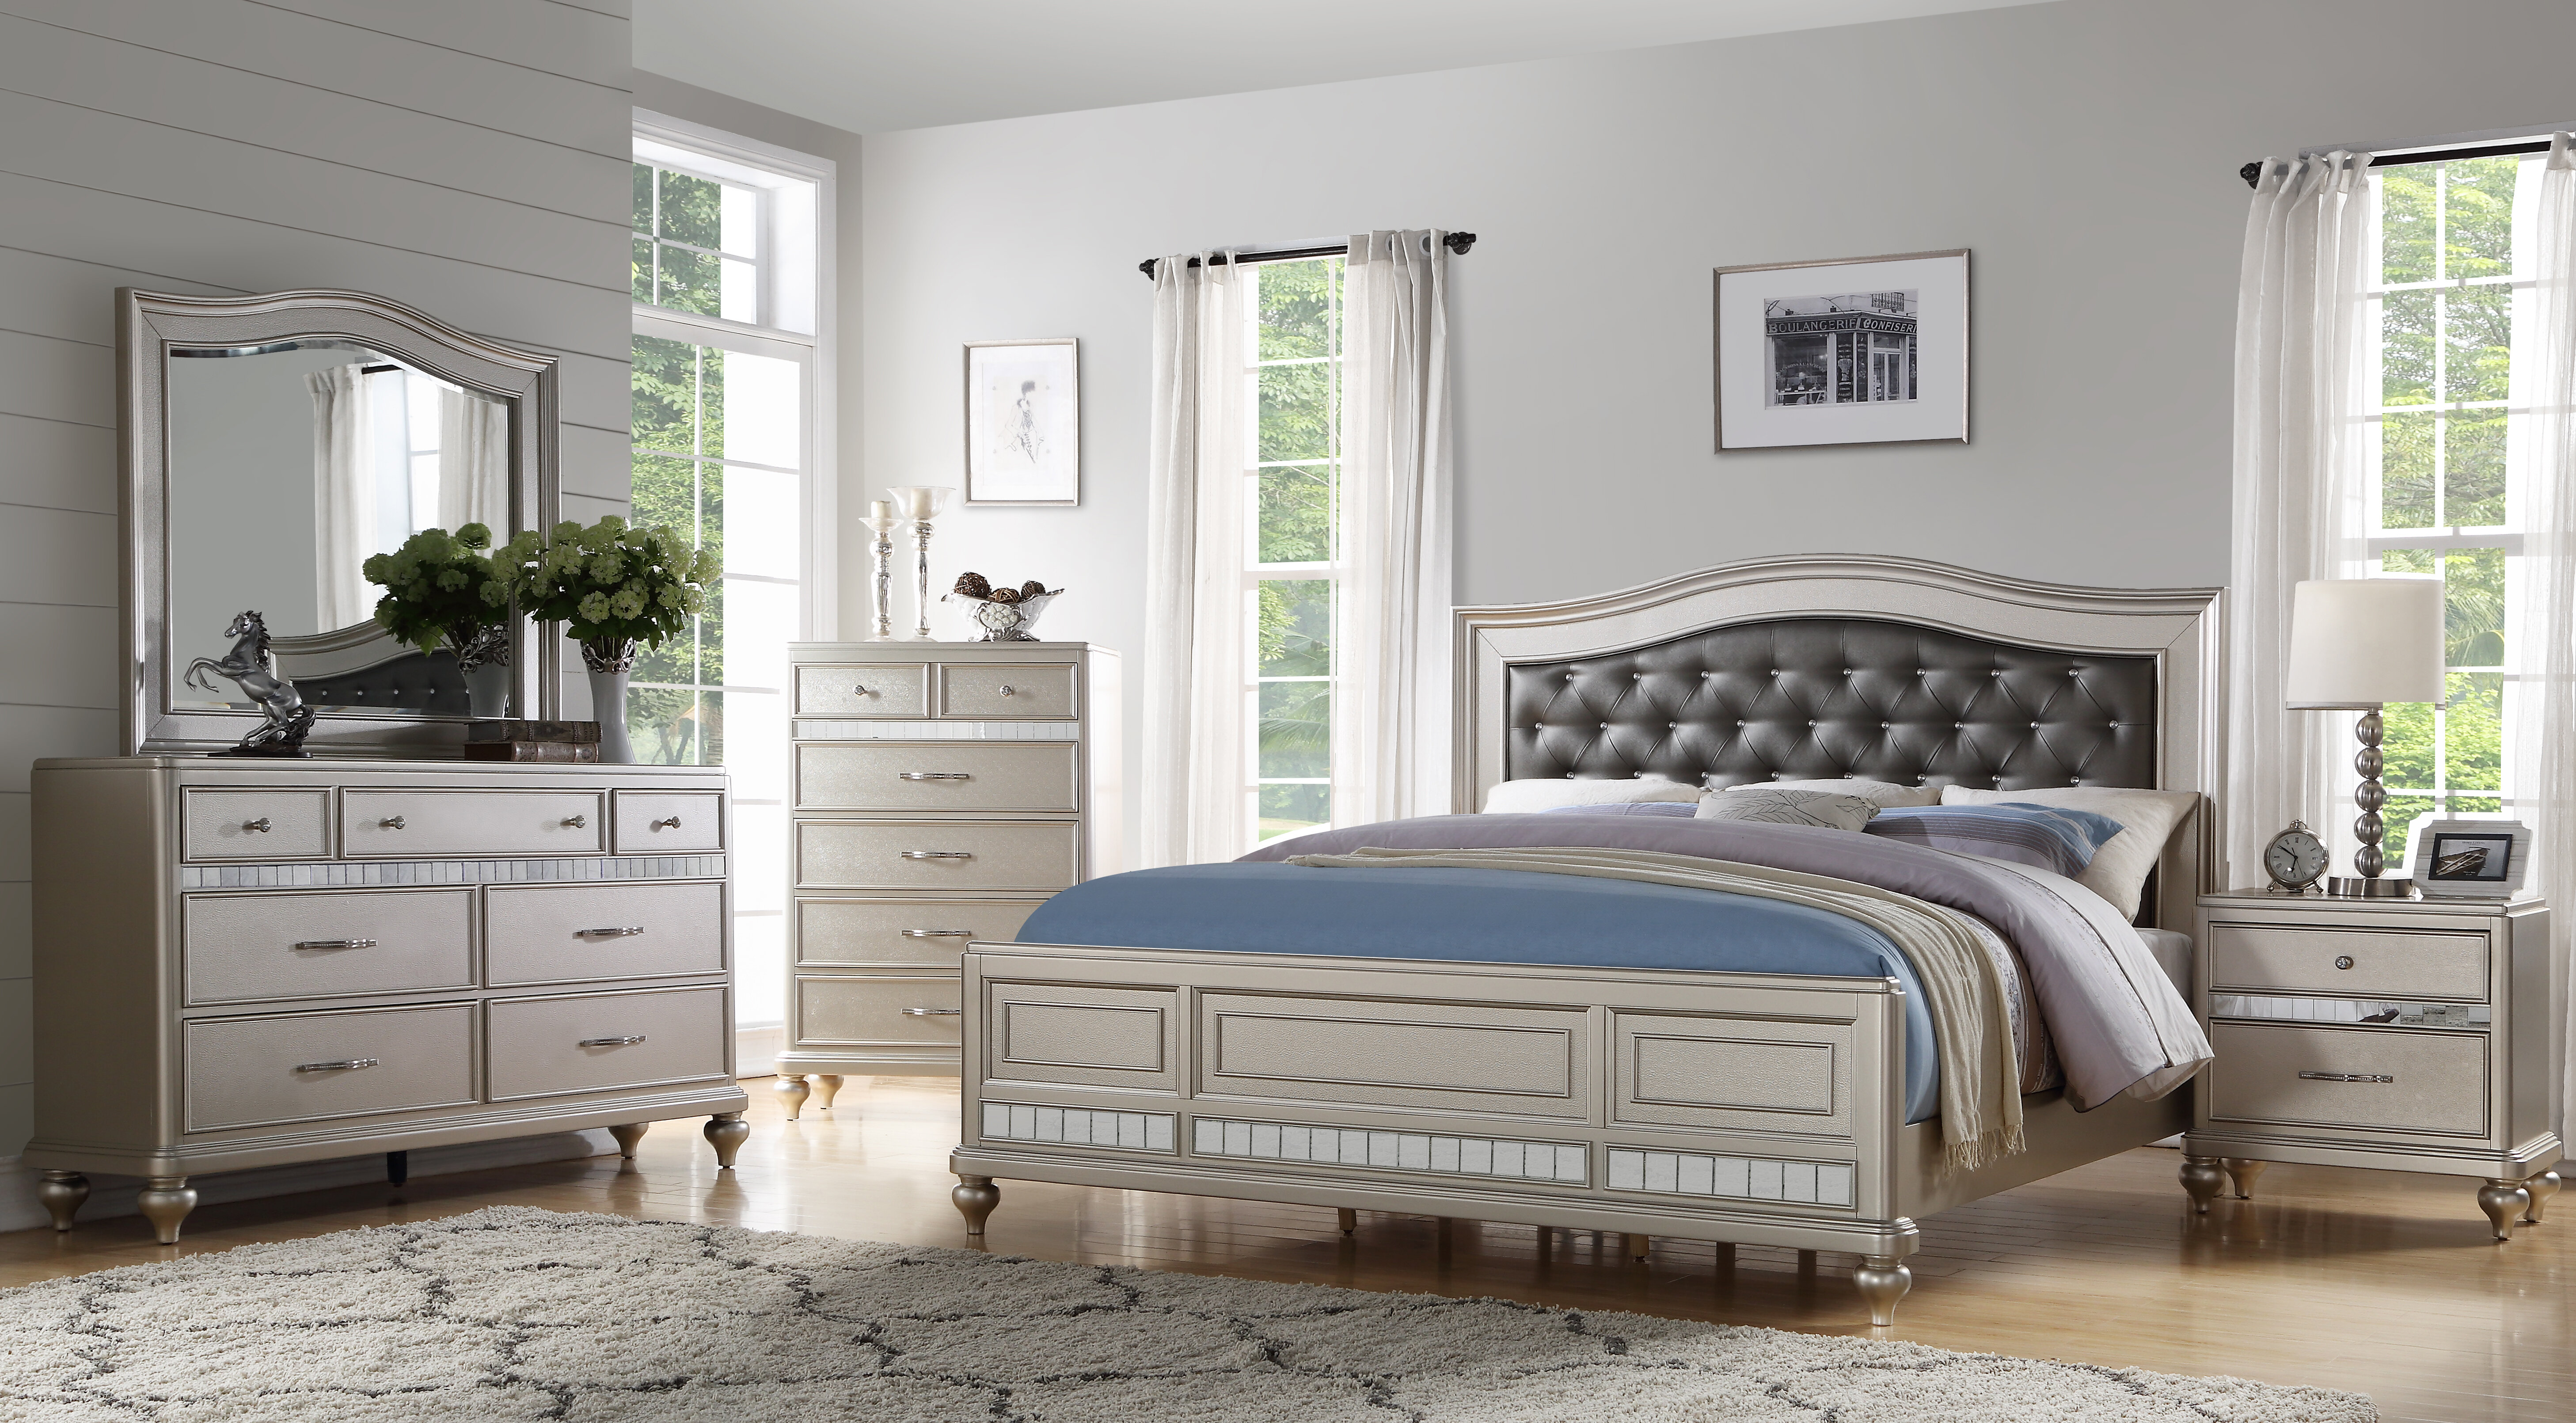 Keytesville 4 Piece Bedroom Set